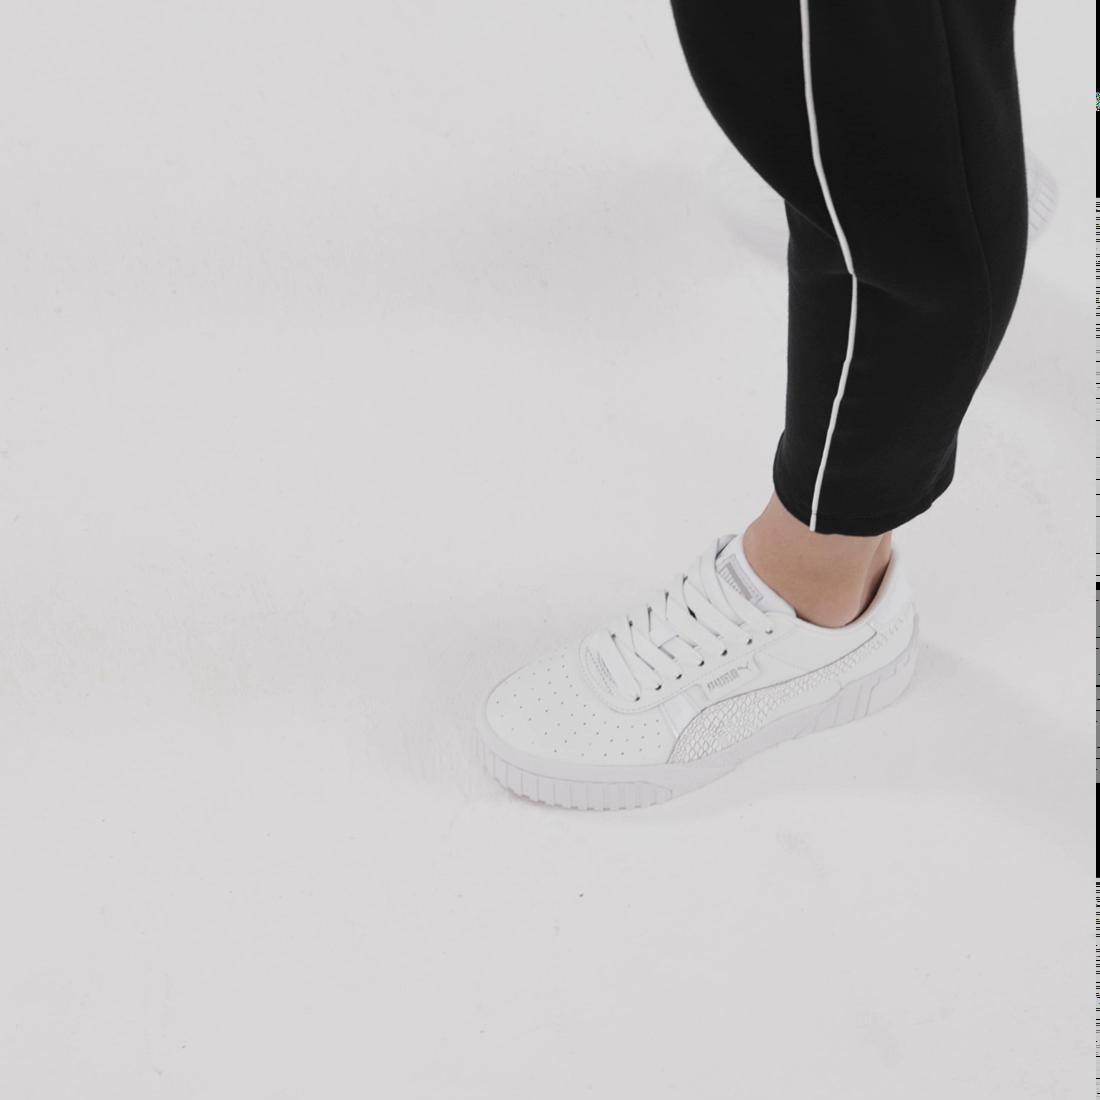 Image PUMA Cali Snake Women's Sneakers #8